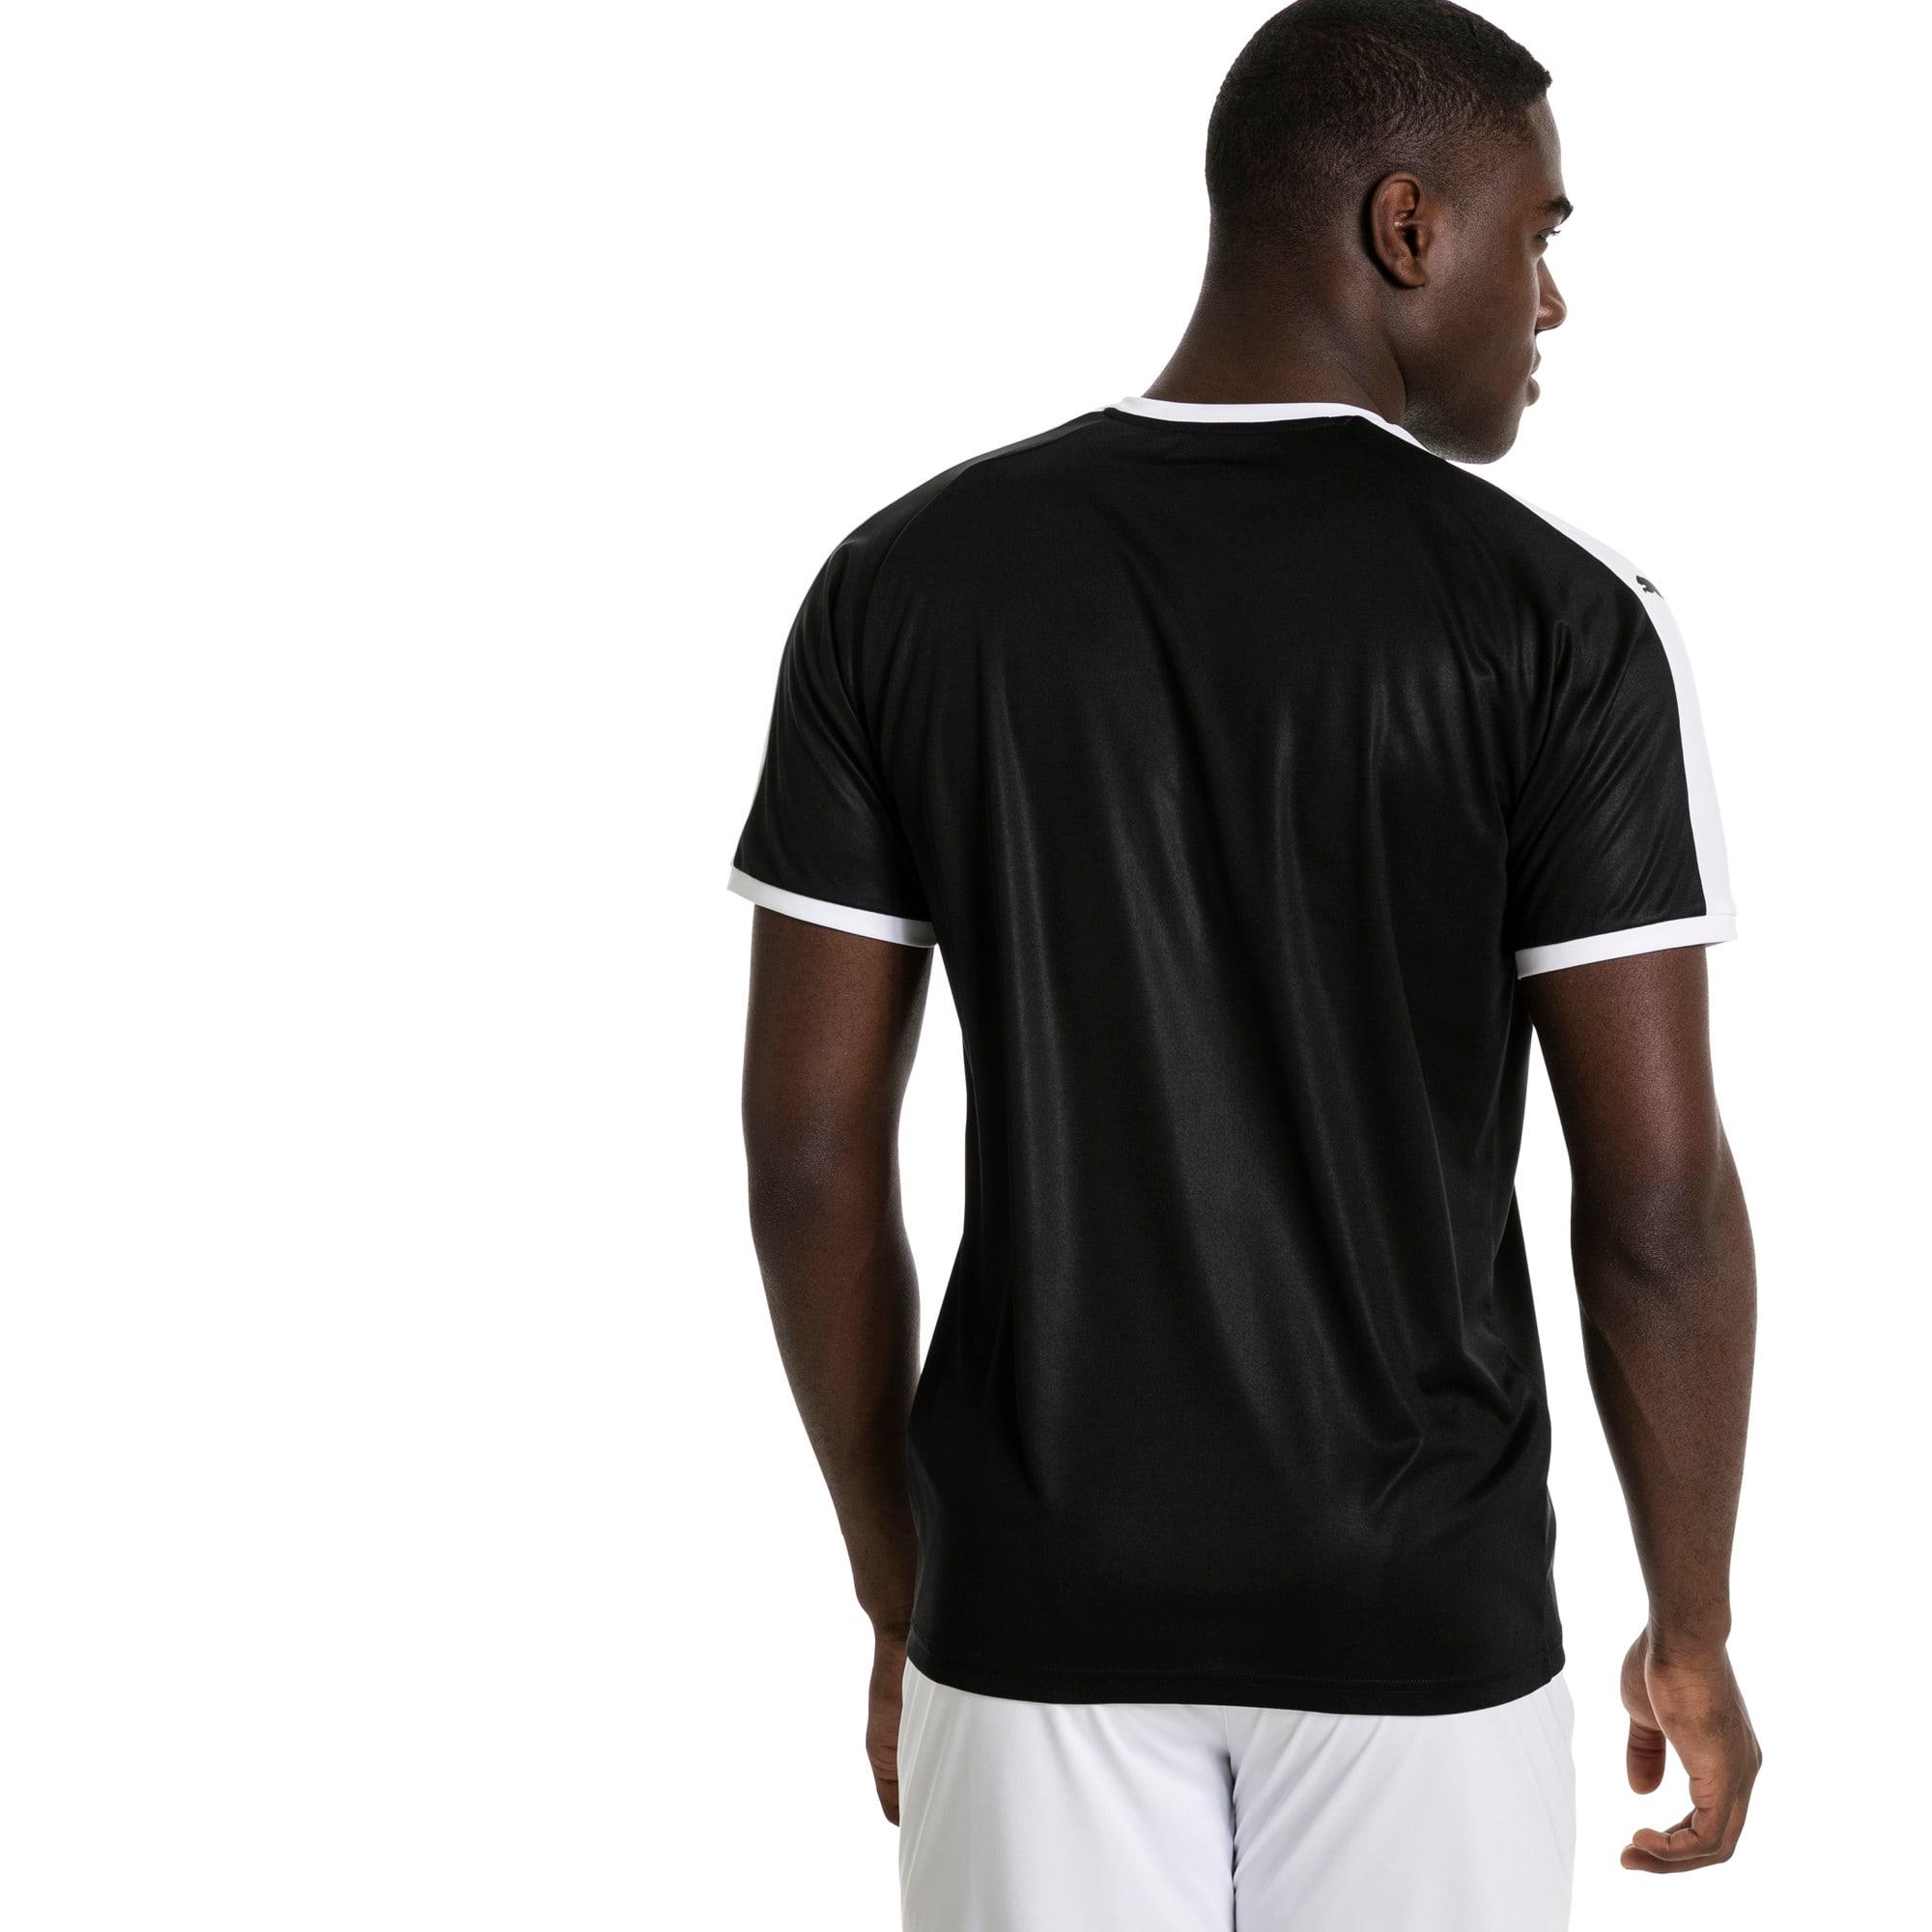 Thumbnail 2 of Liga shirt voor heren, Puma Black-Puma White, medium